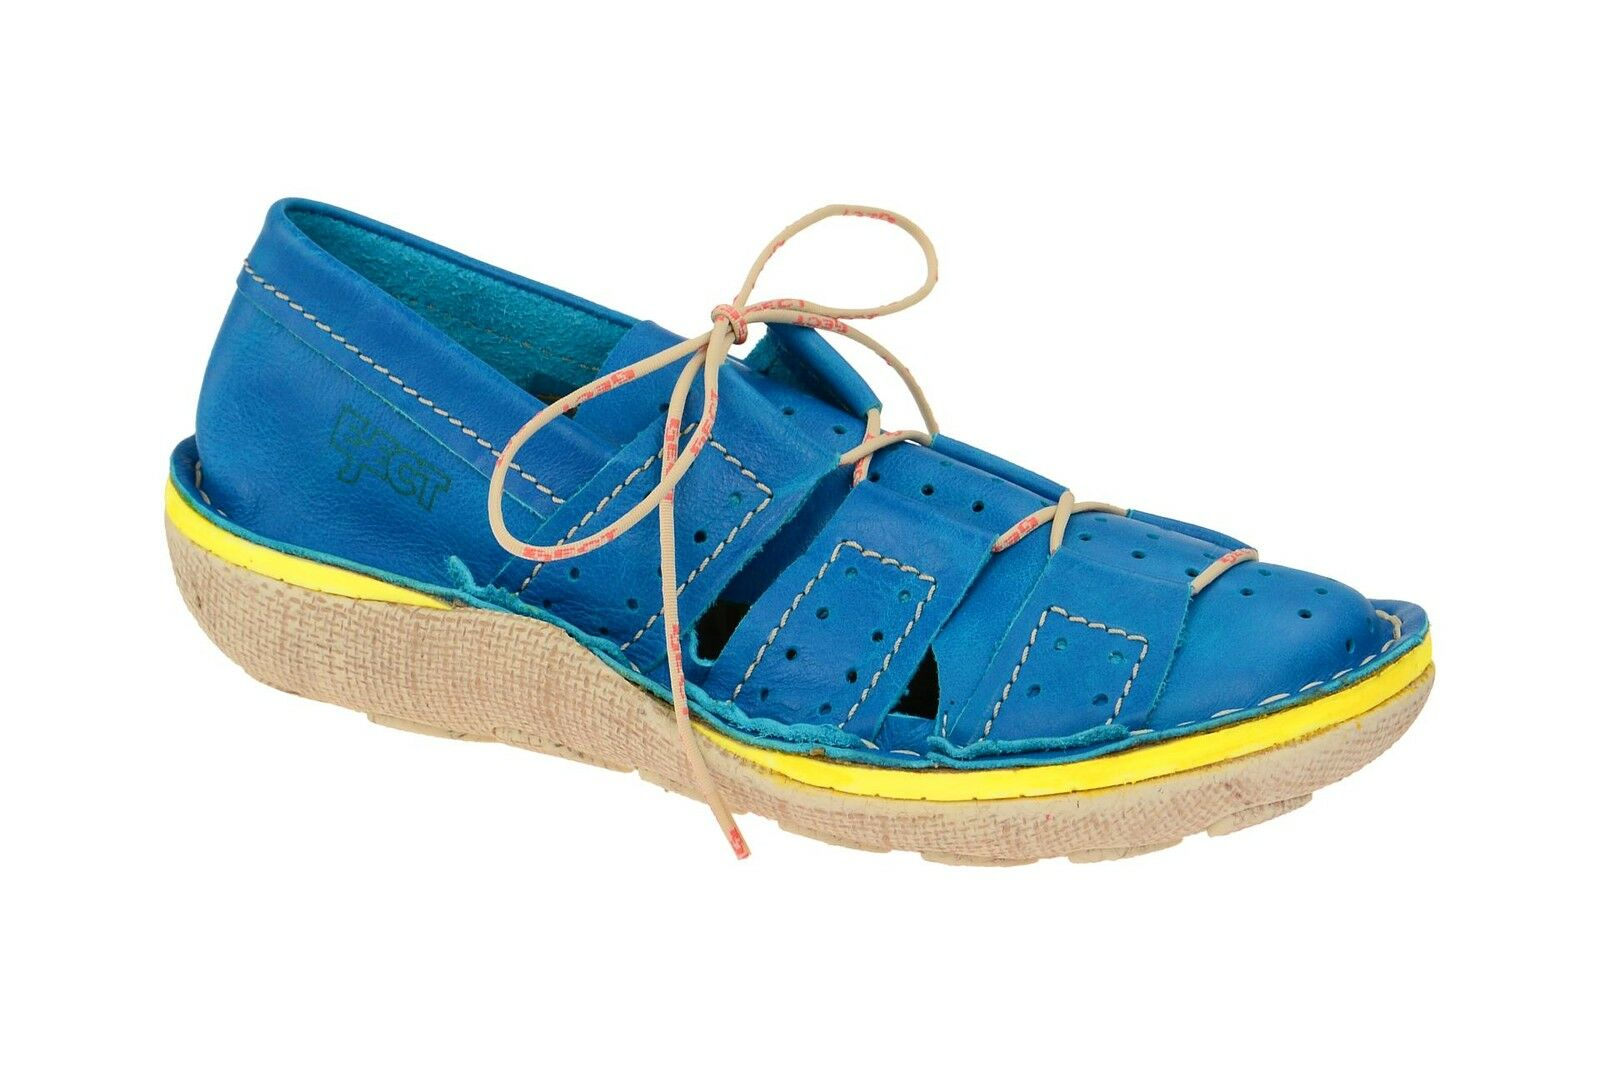 Eject Schuhe FIXE blau Herrenschuhe sportliche Halbschuhe 18293.003 NEU